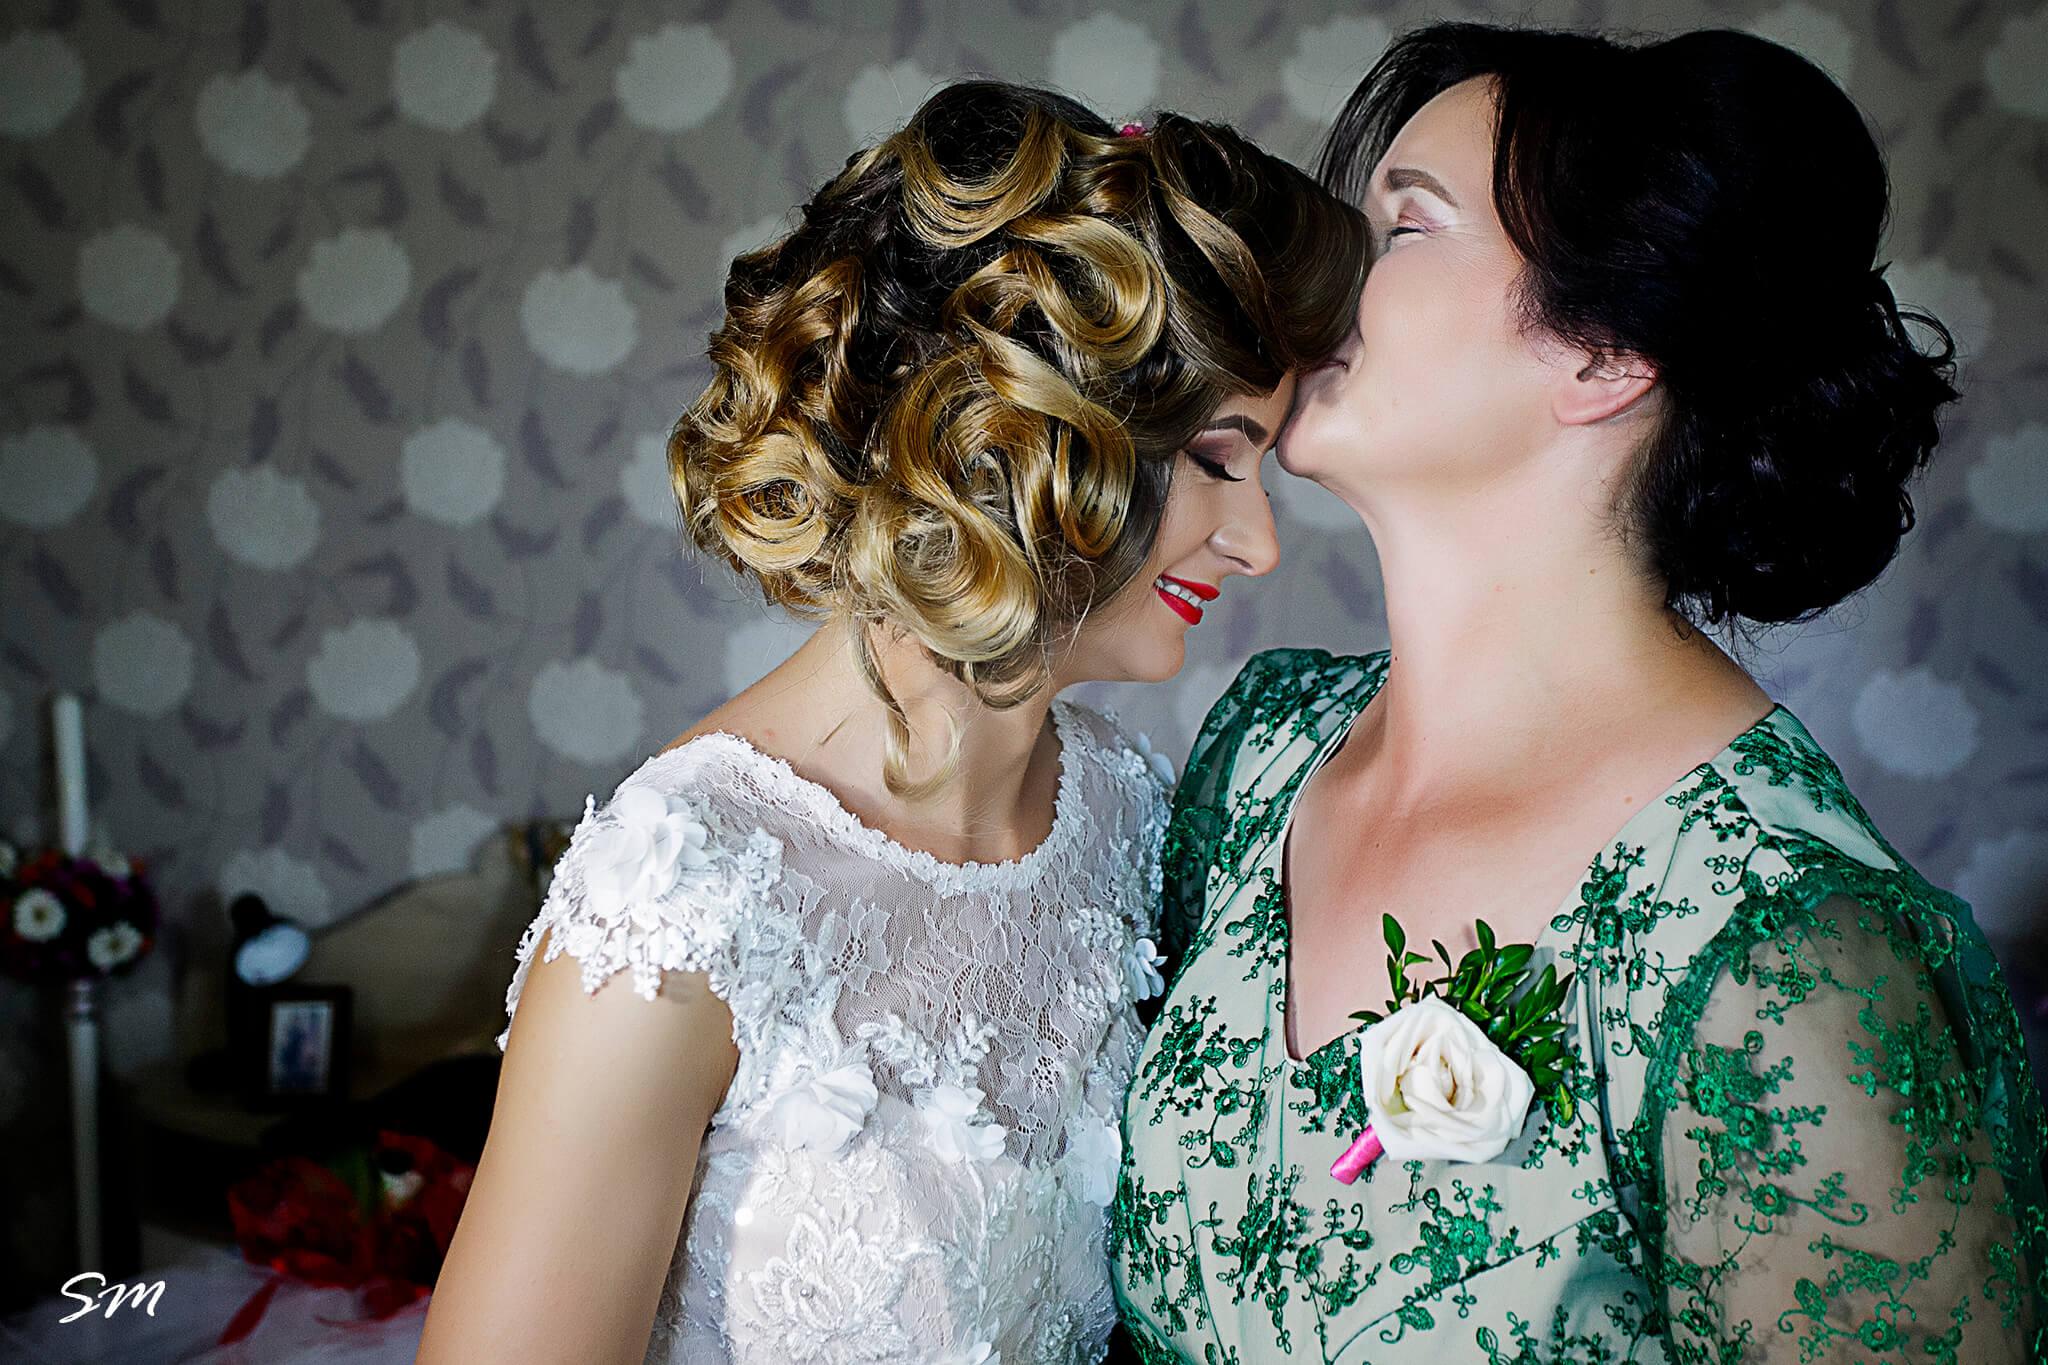 fotograf_nunta_profesionist_suceava (16)